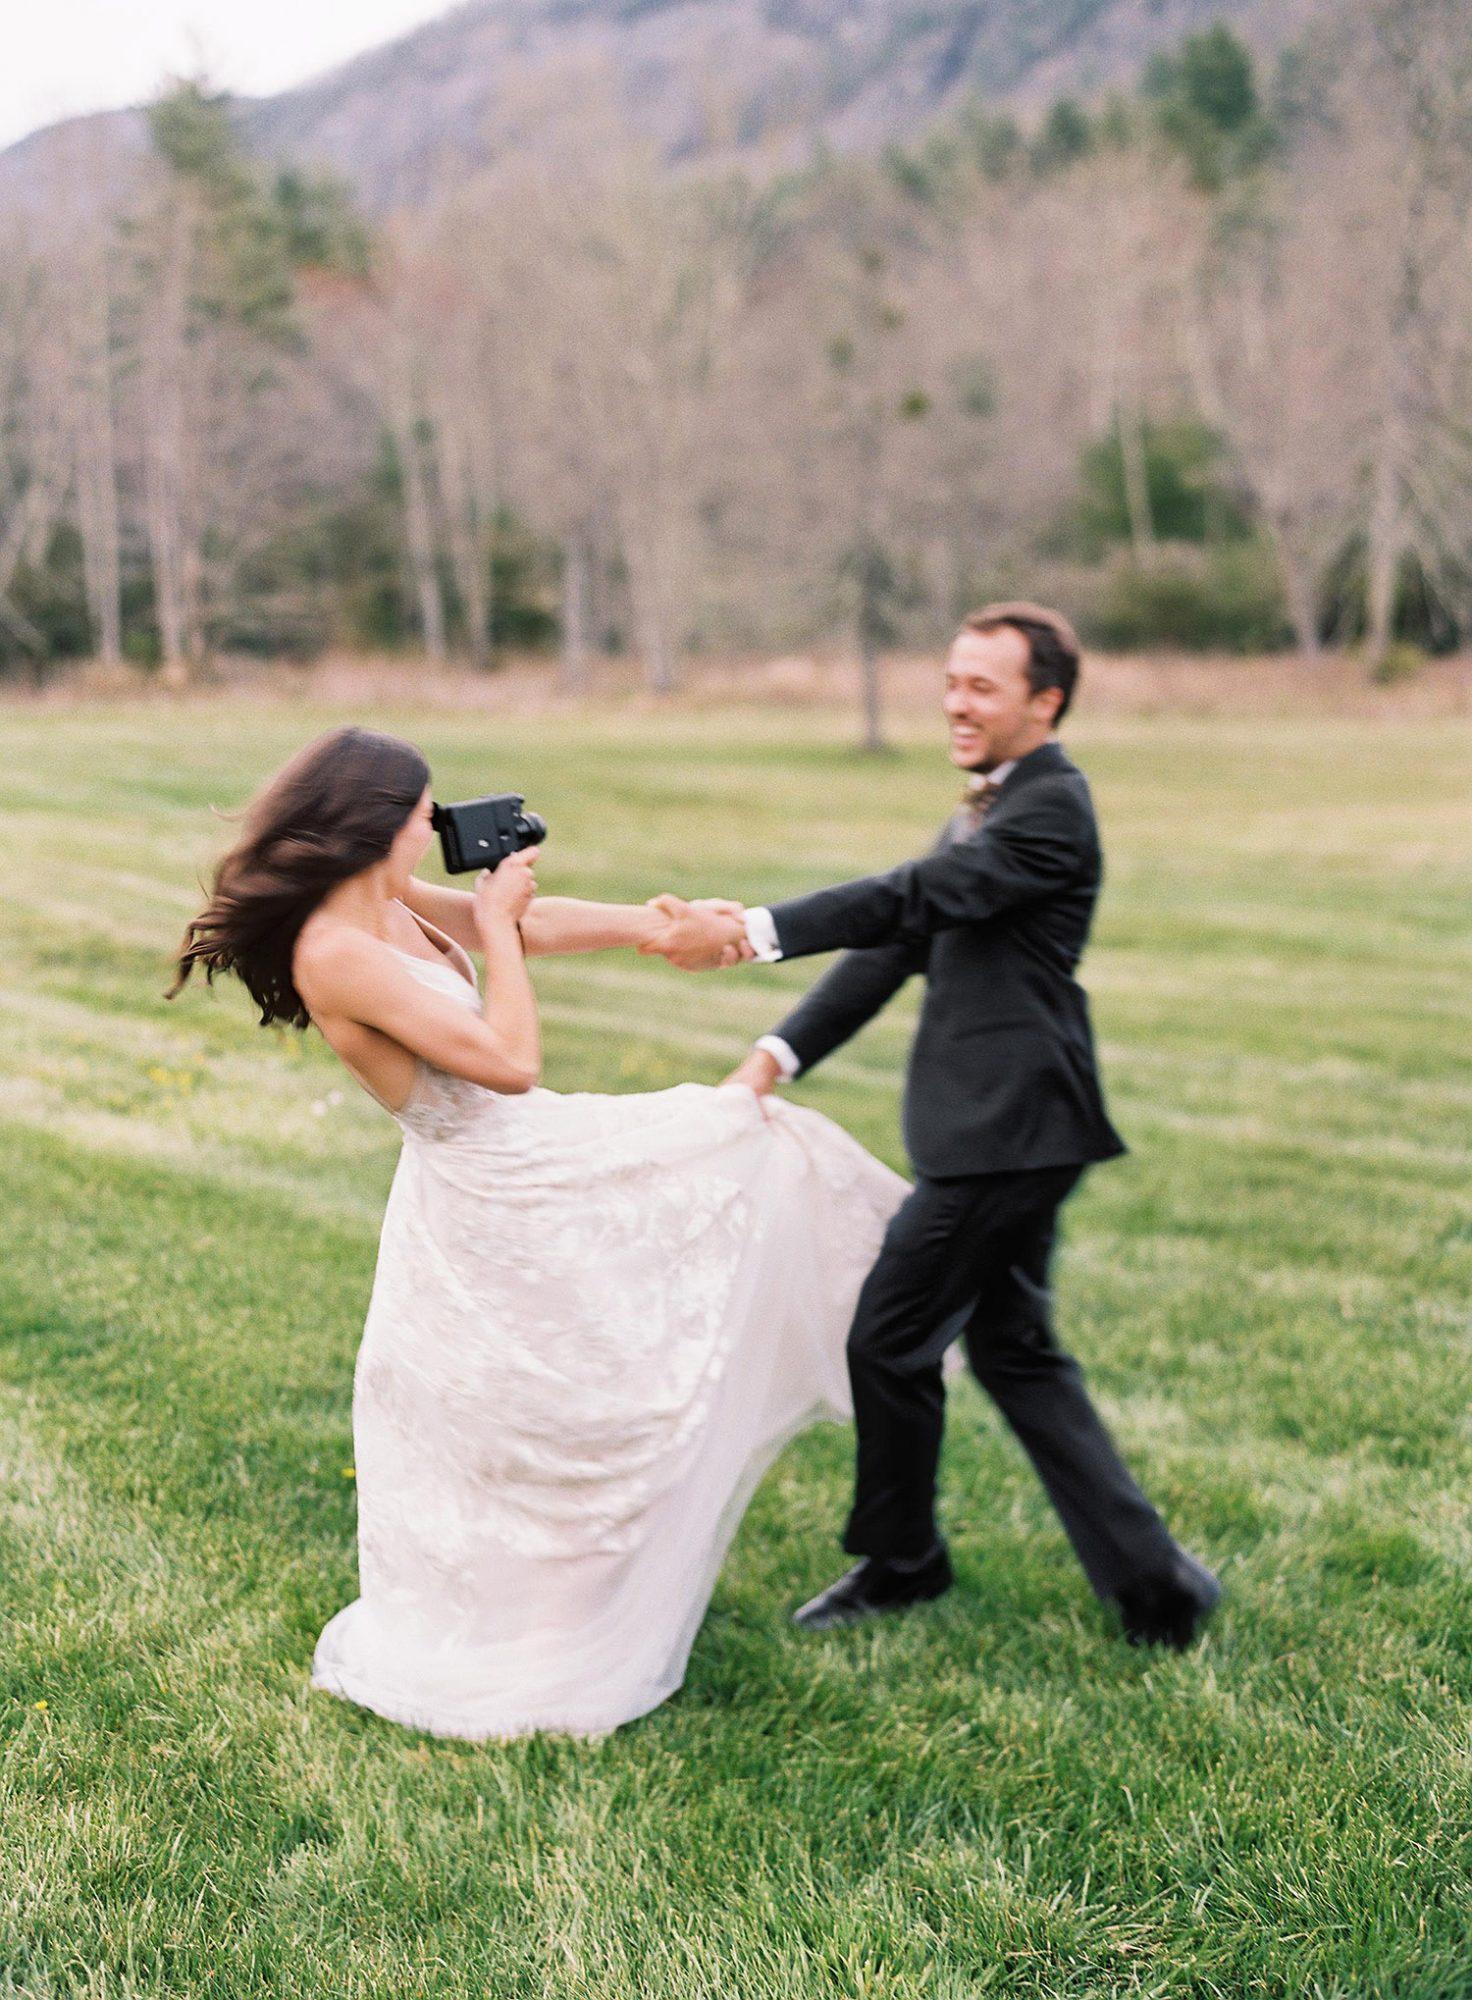 maya trey wedding couple video camera